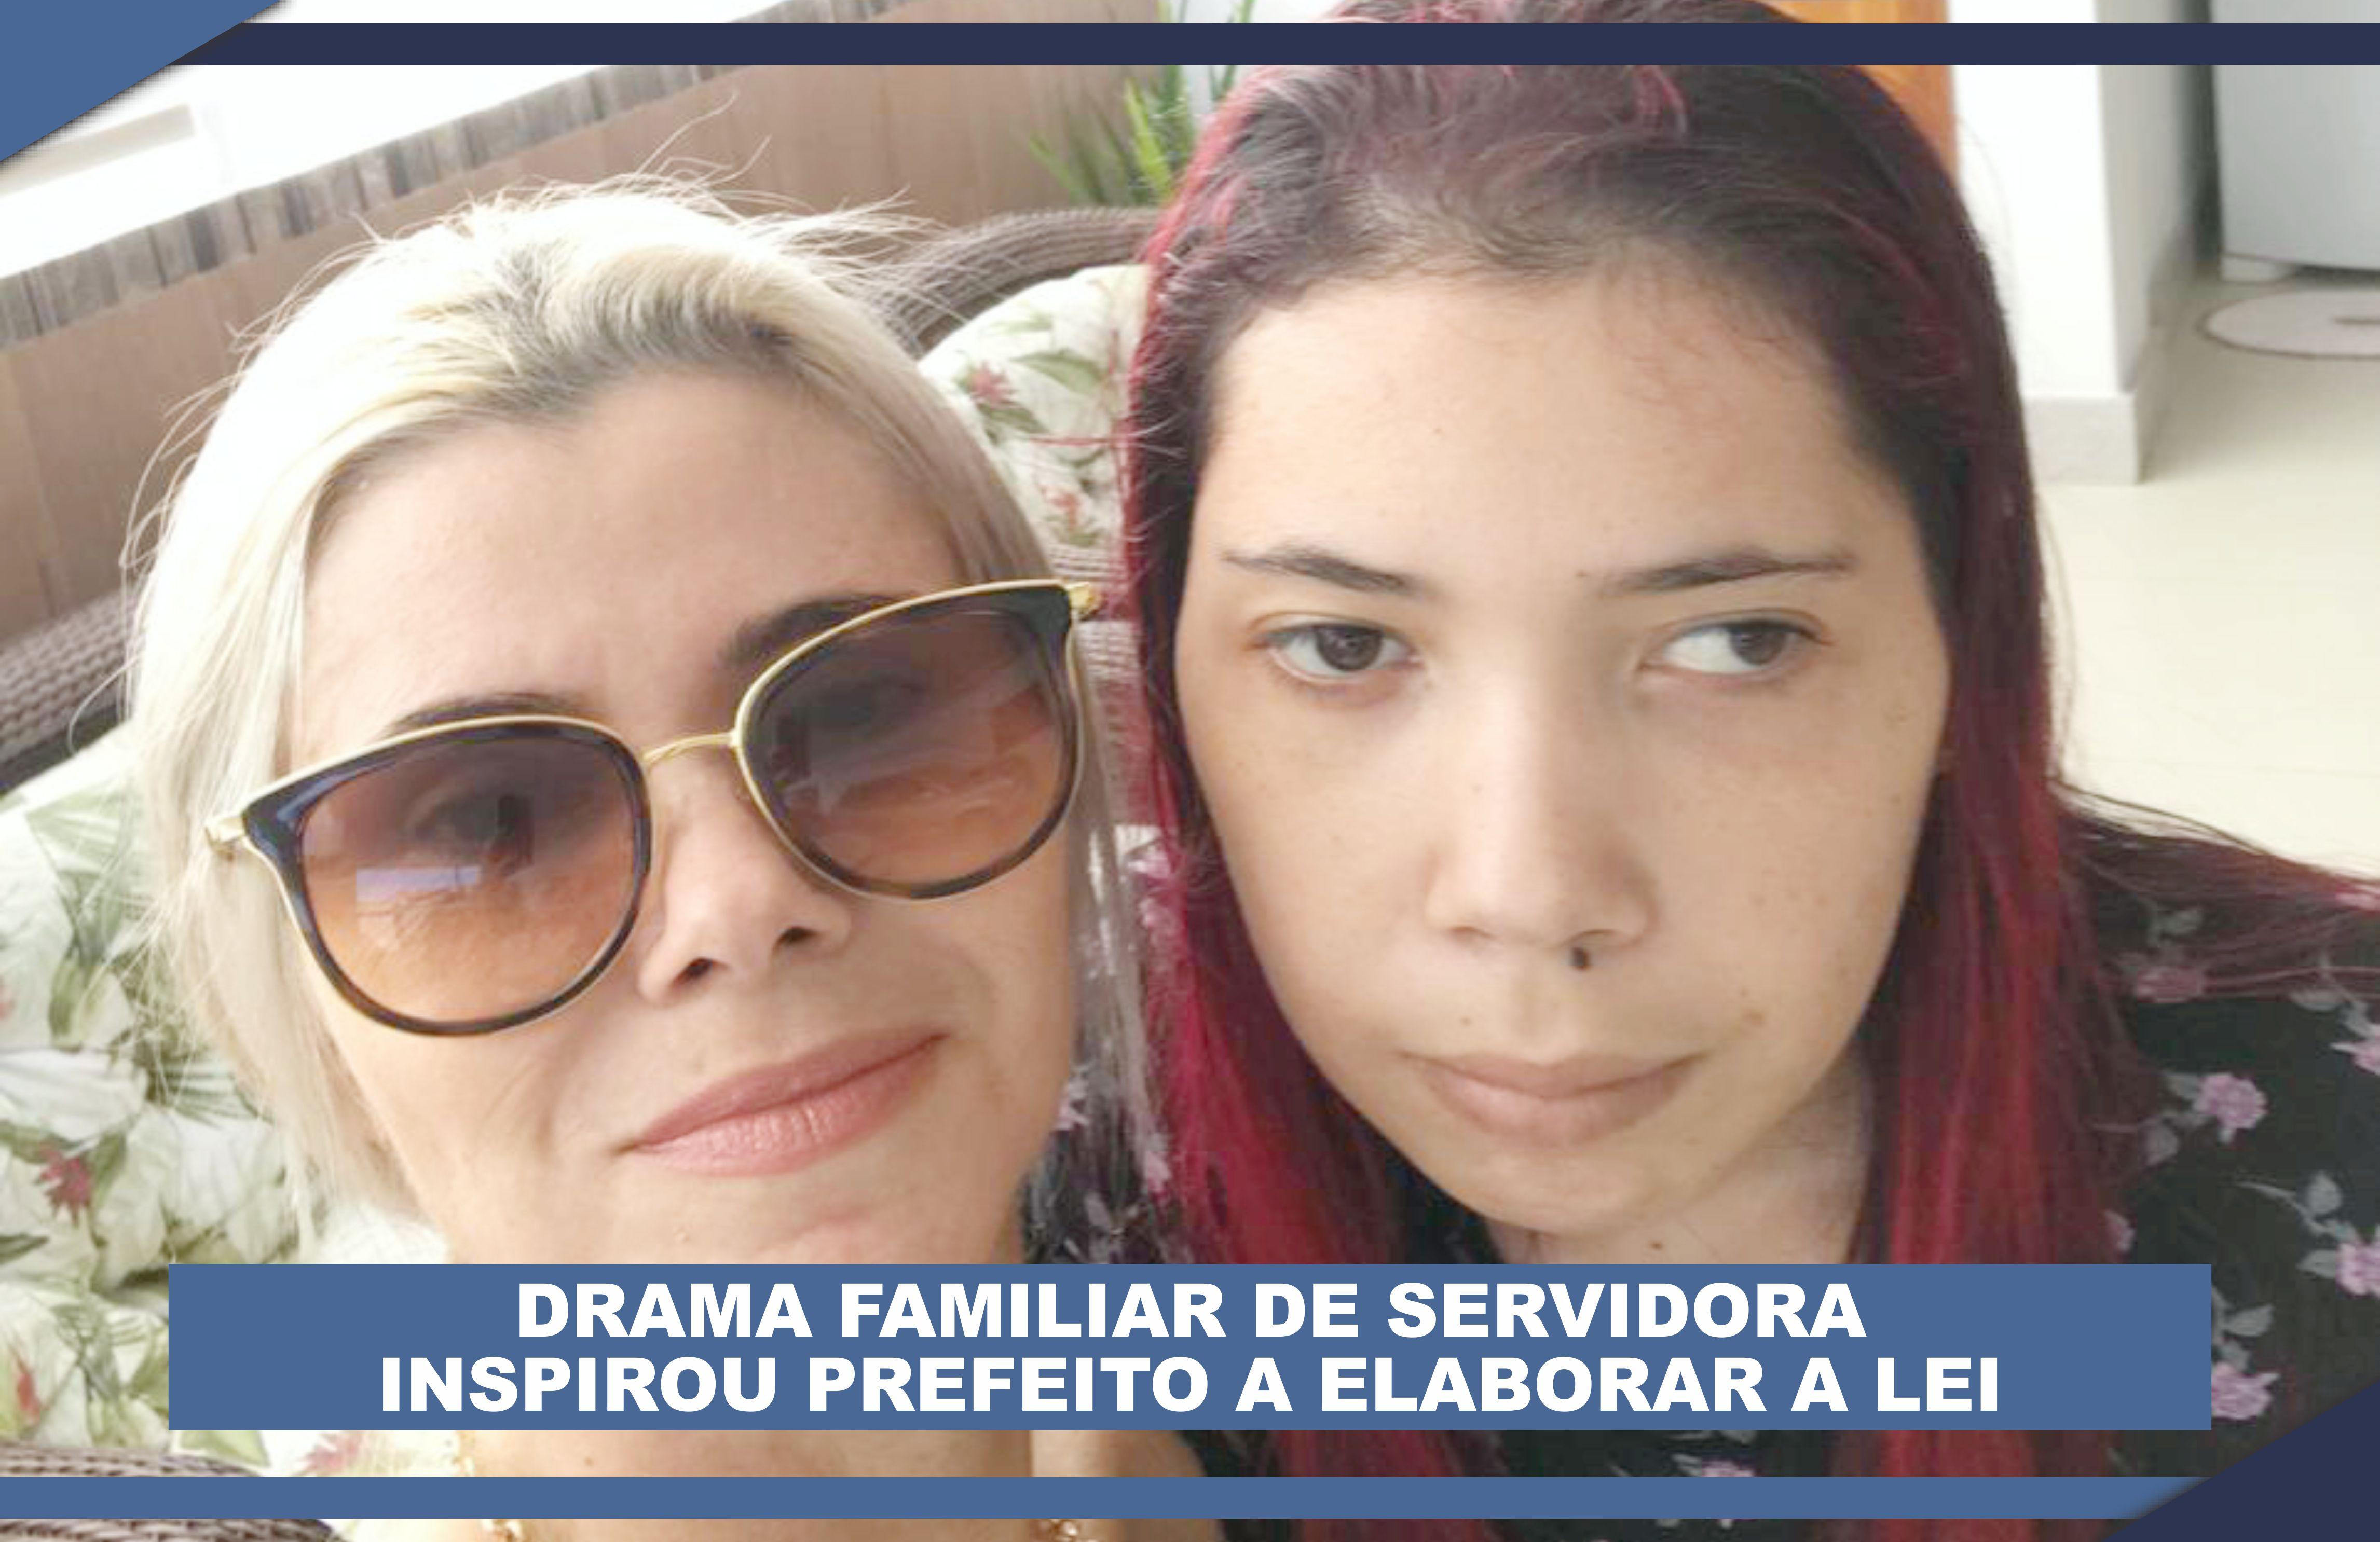 Drama Familiar de Servidora Inspirou Prefeito a Elaborar a Lei